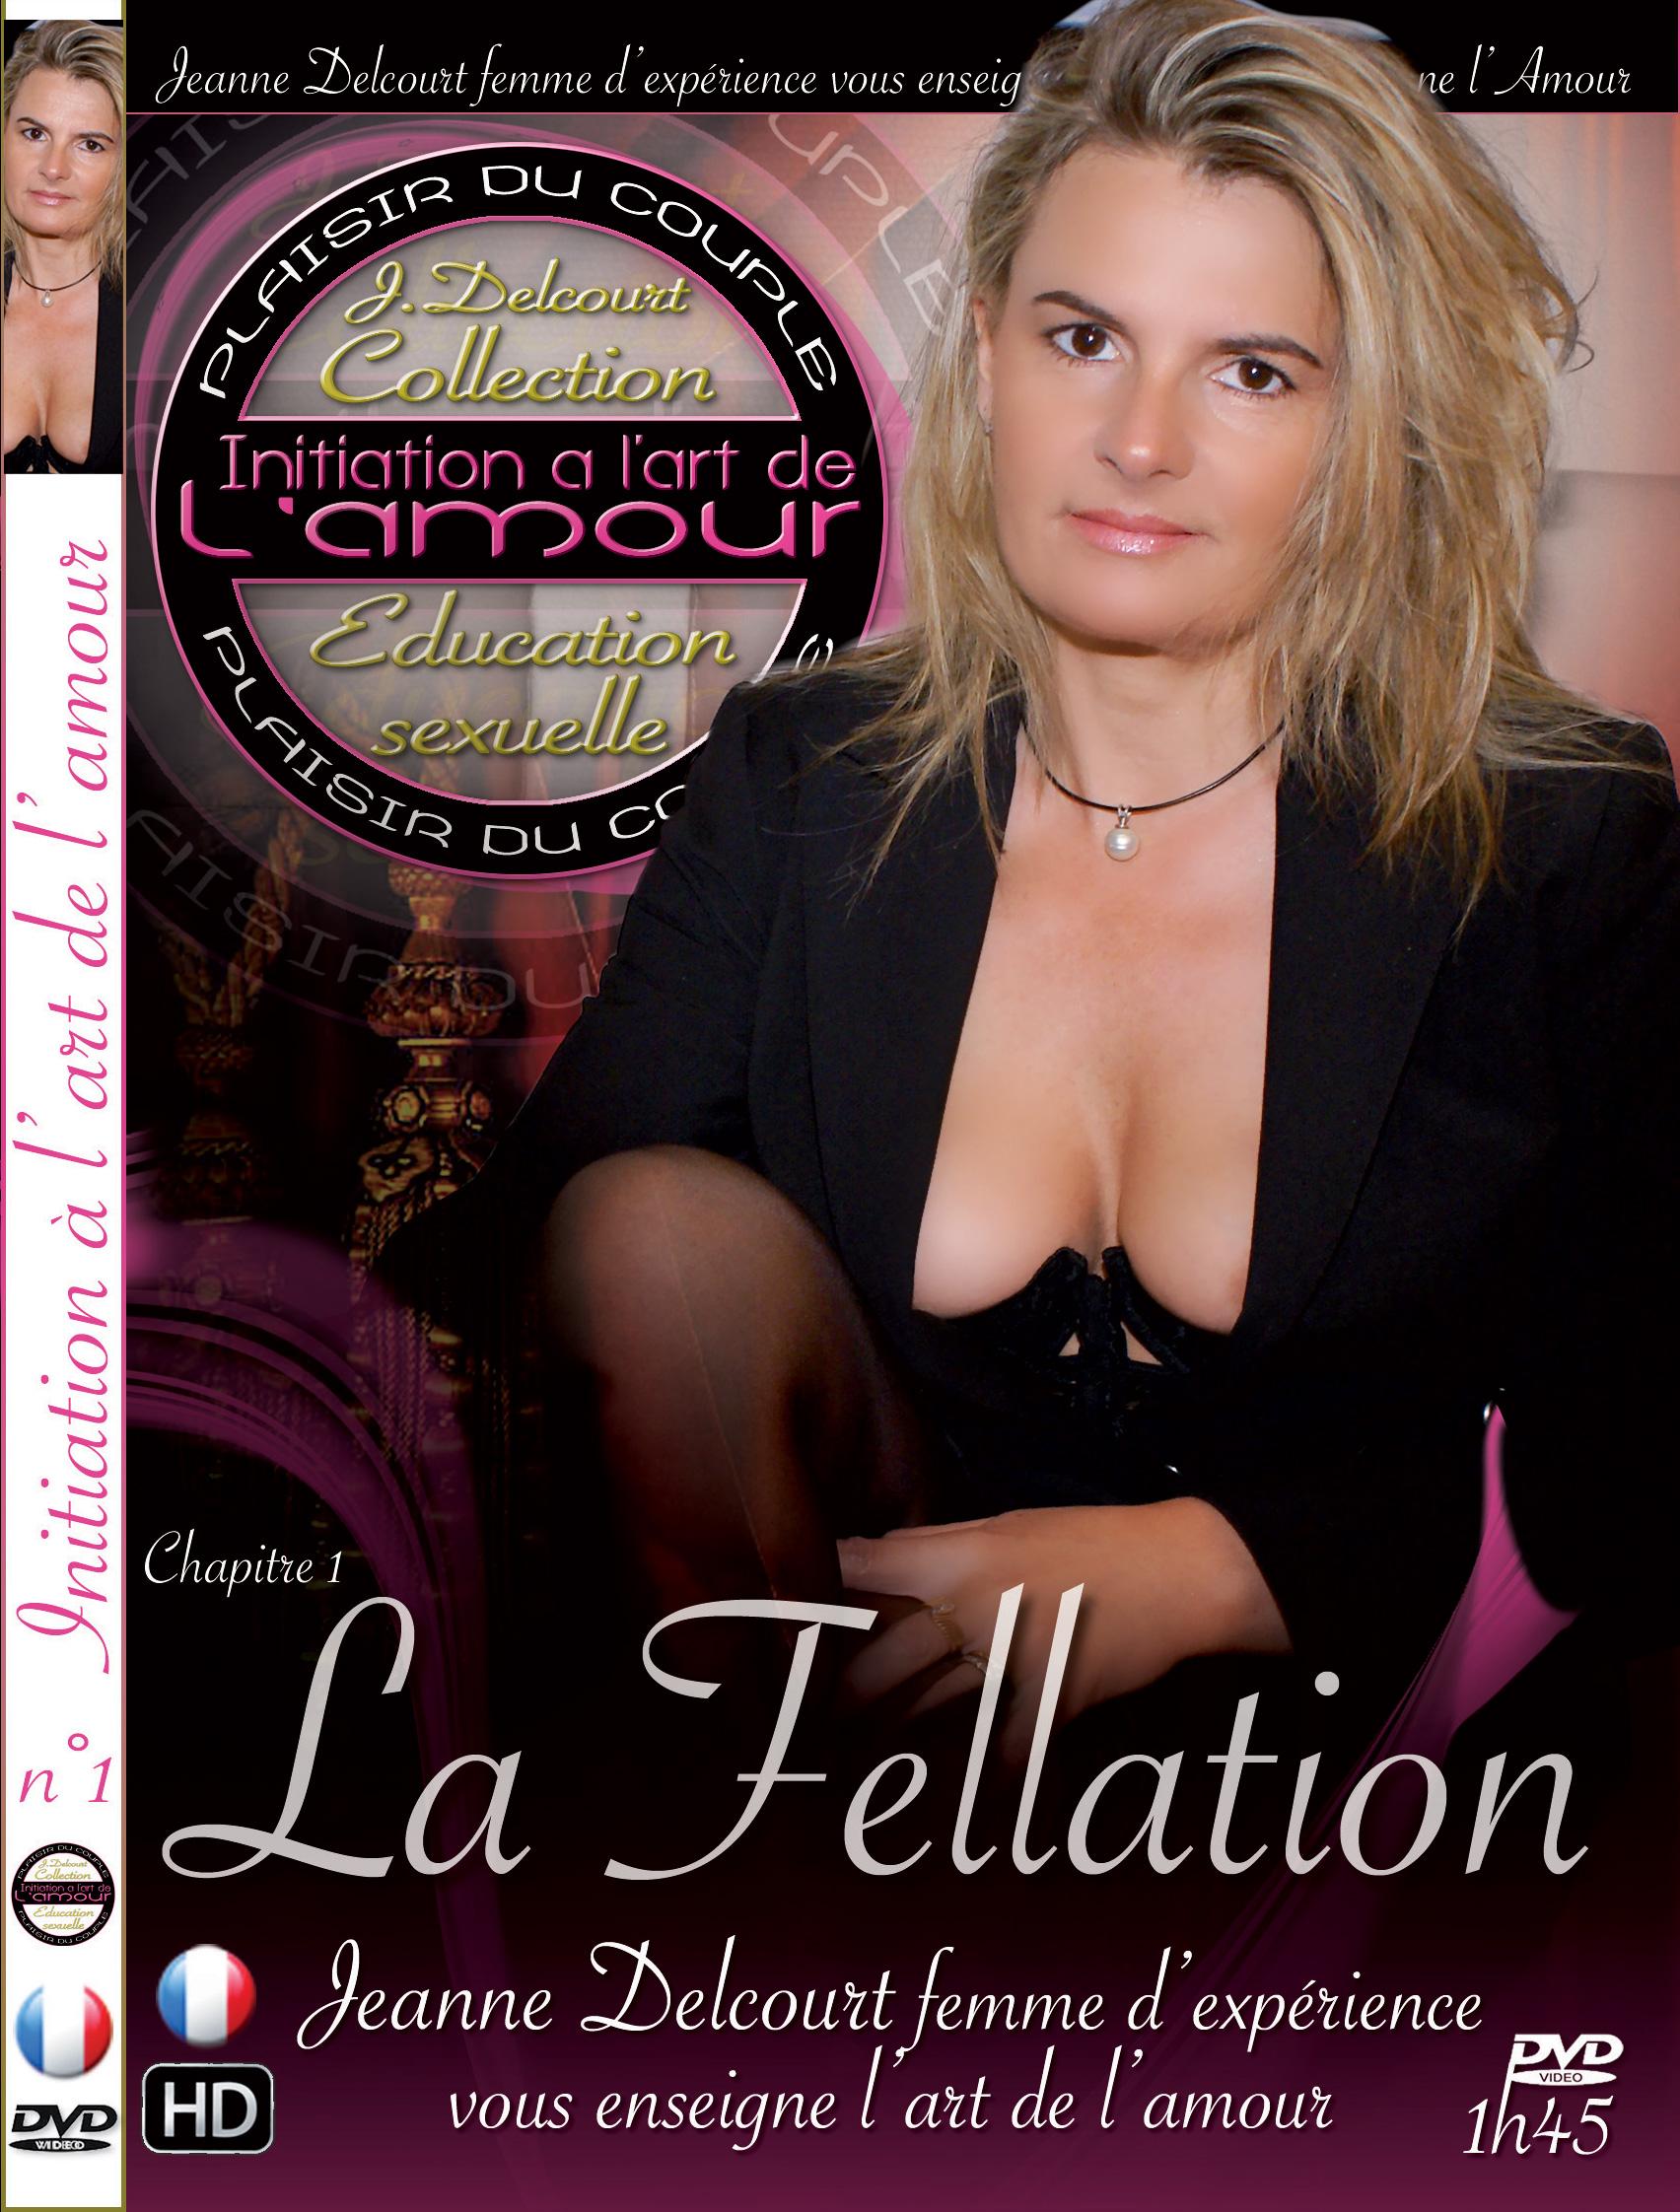 L initiation a la felletion - 59:54